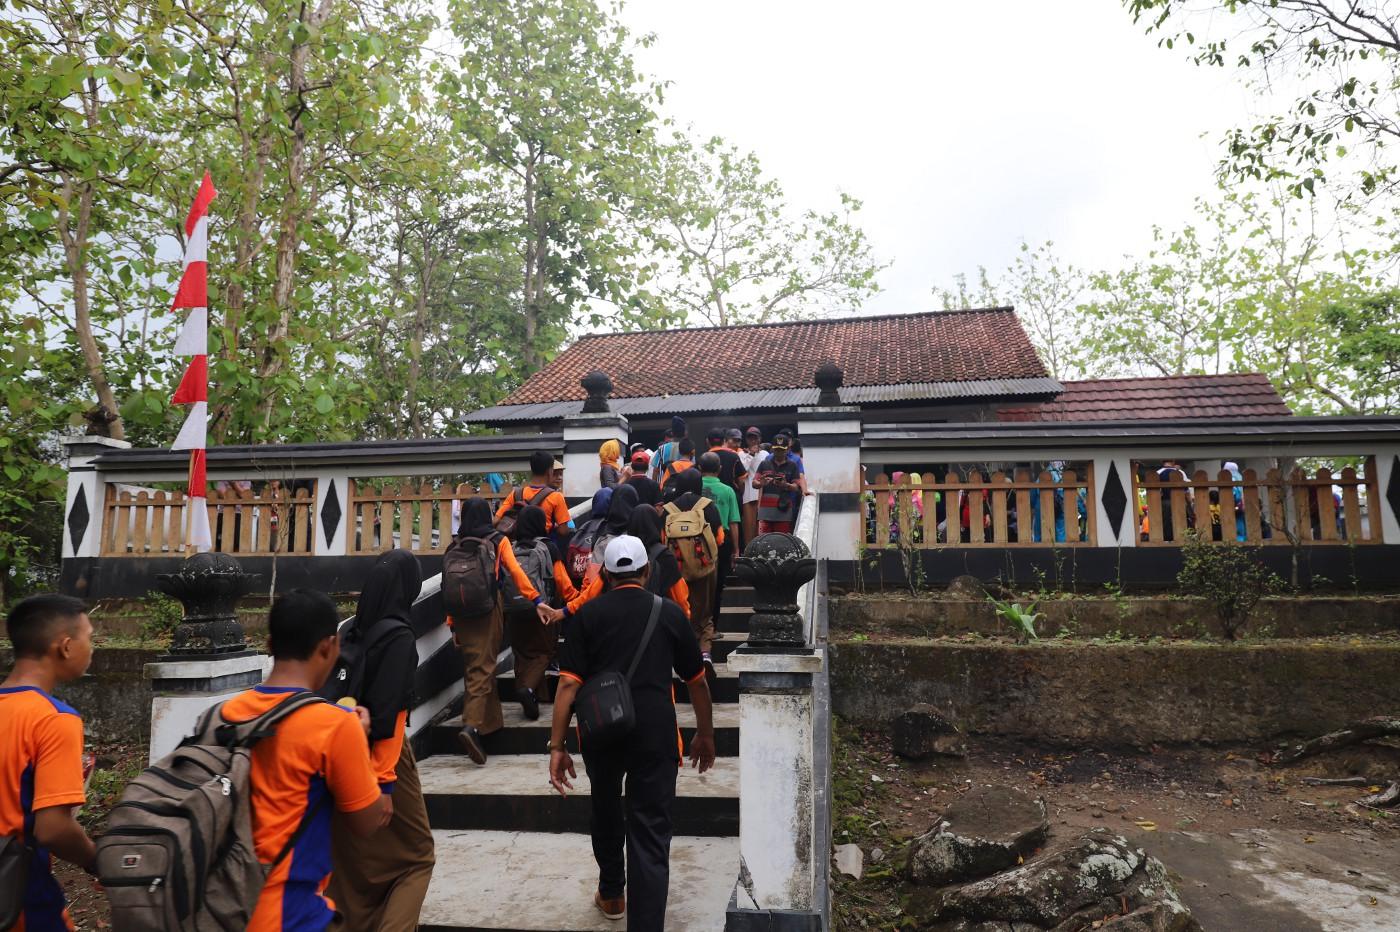 Bupati Dorong Pengembangan Wisata Budaya Desa Kaliwatubumi